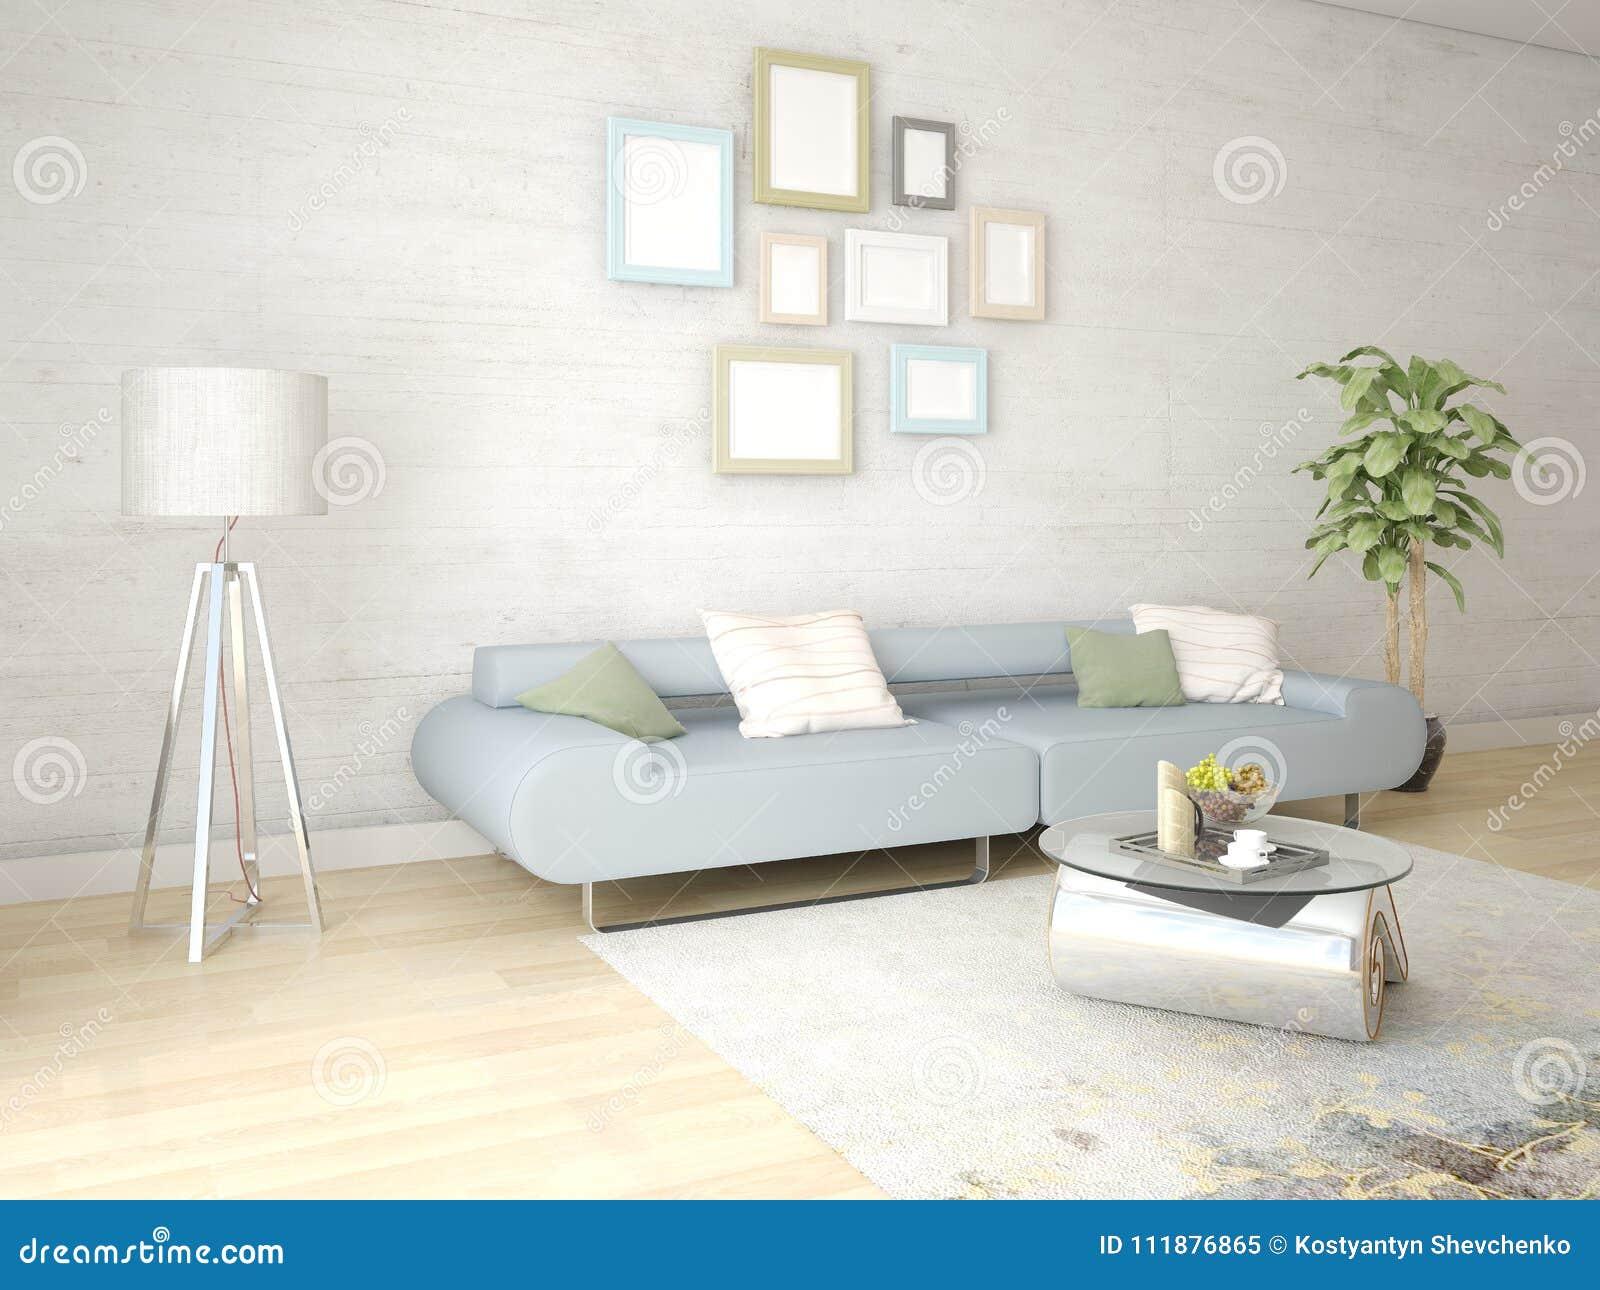 https://thumbs.dreamstime.com/z/spot-omhoog-een-heldere-woonkamer-met-exclusieve-staande-lamp-111876865.jpg